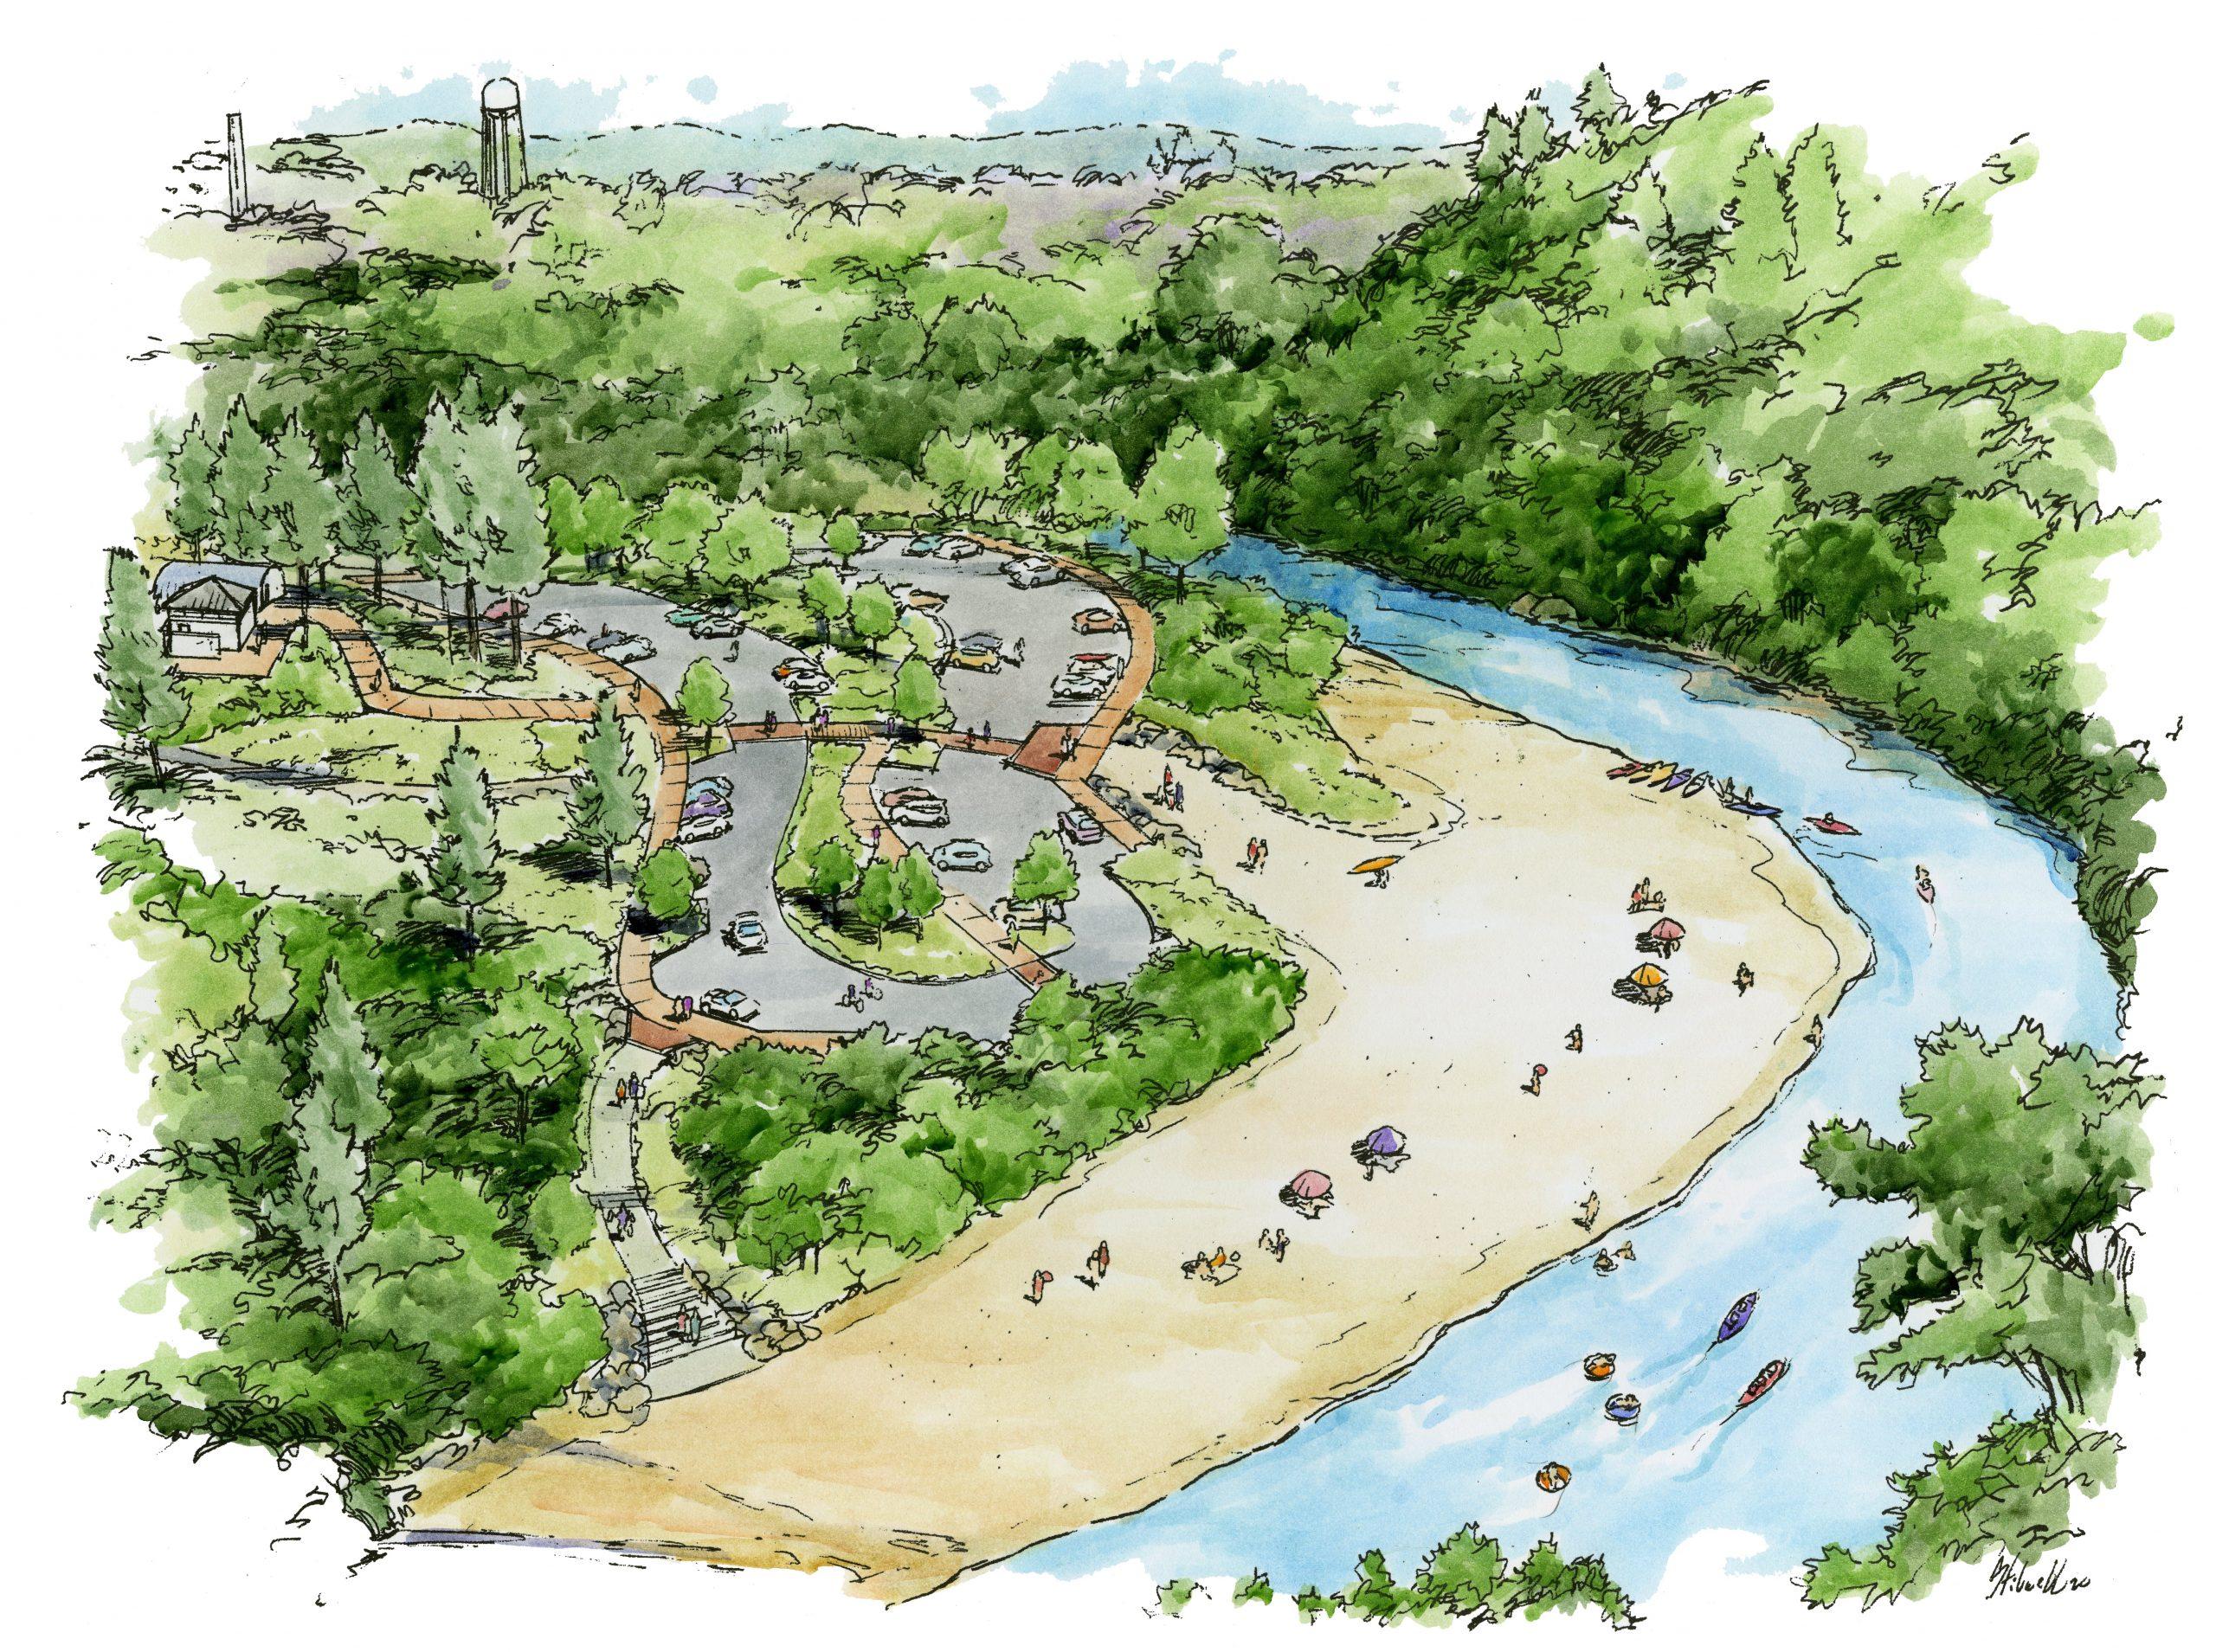 Park Planning & Design